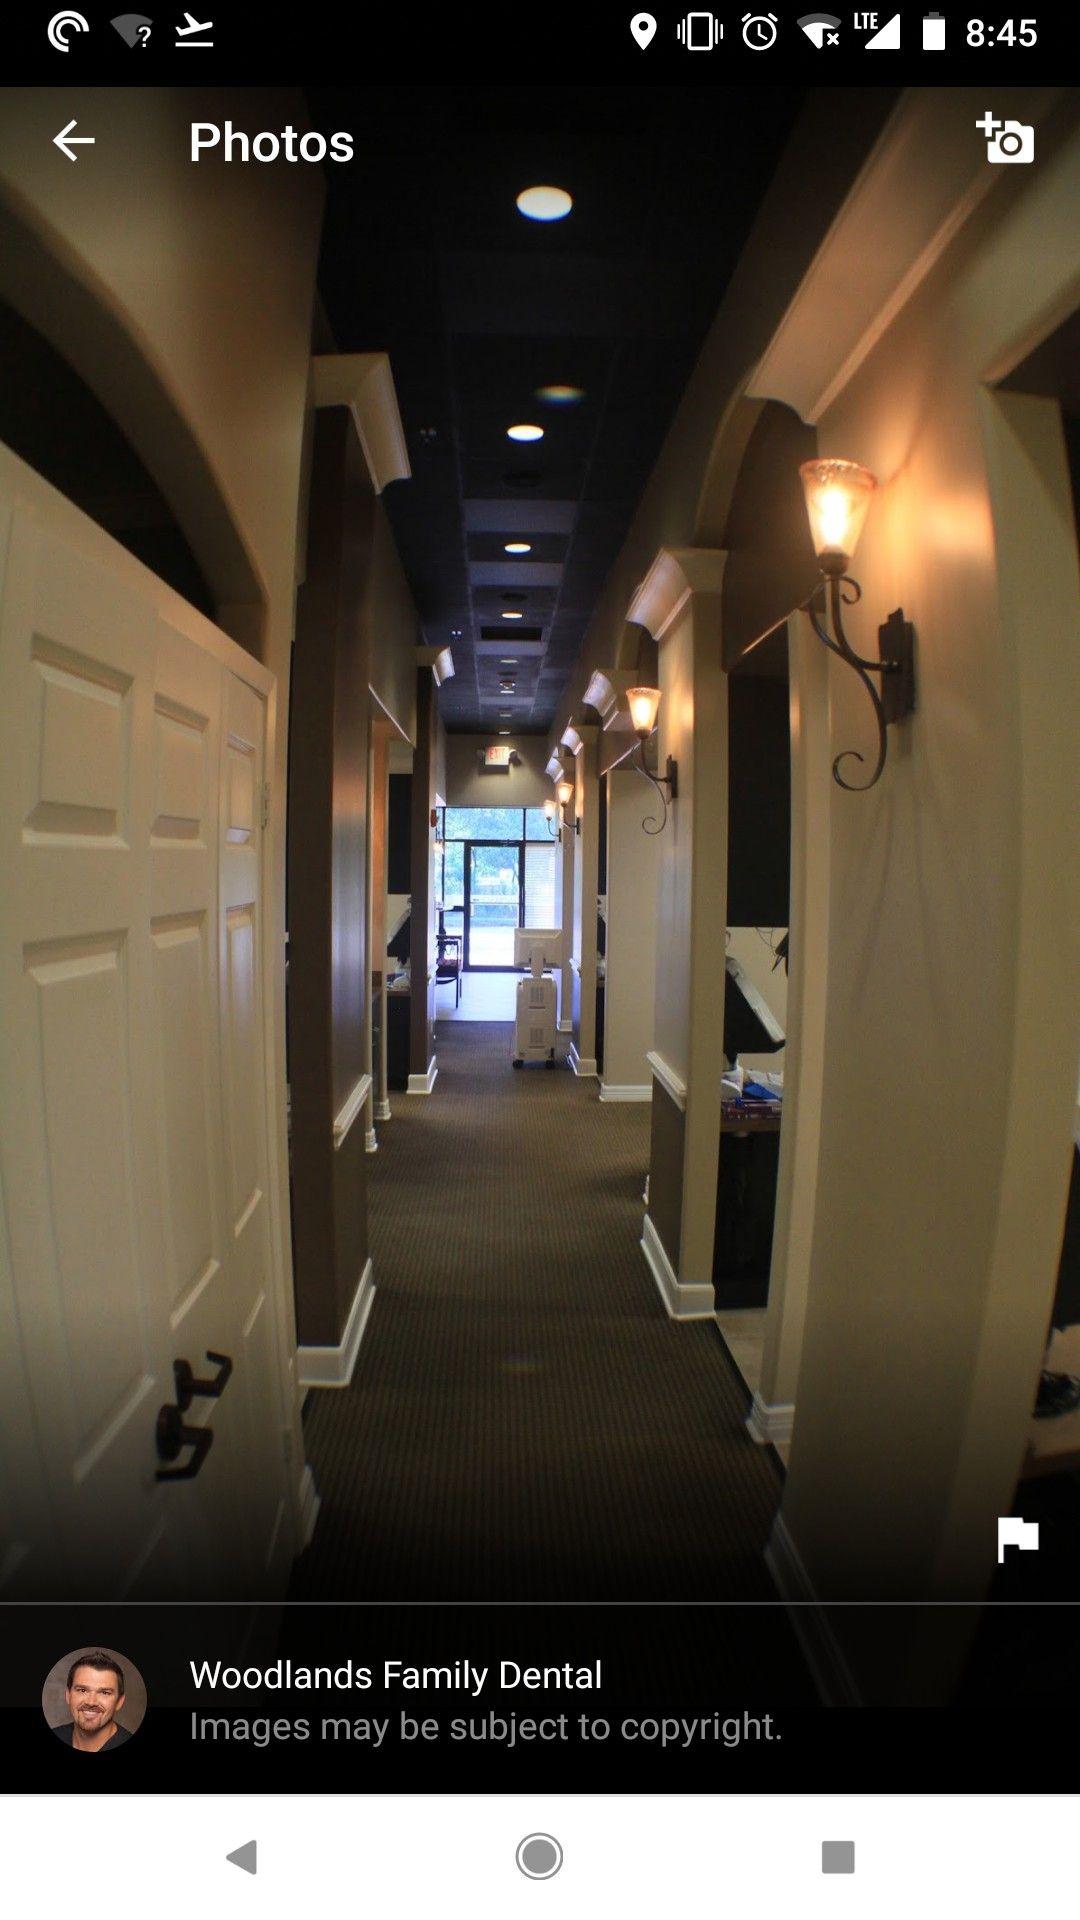 Black Ceiling Tiles In The Hallway Dental Office Design